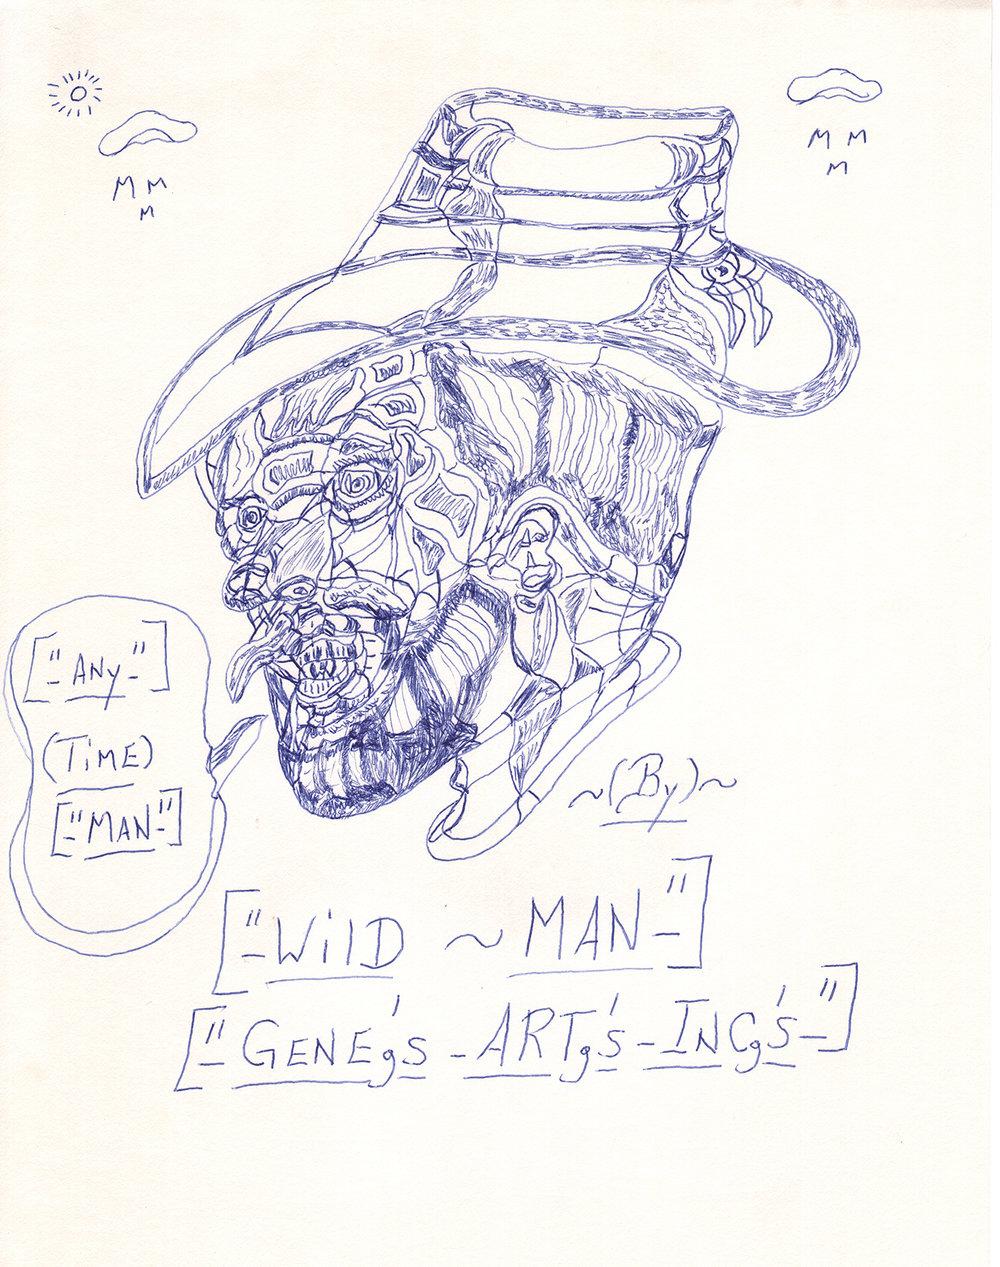 Wild Man by Gene Merritt